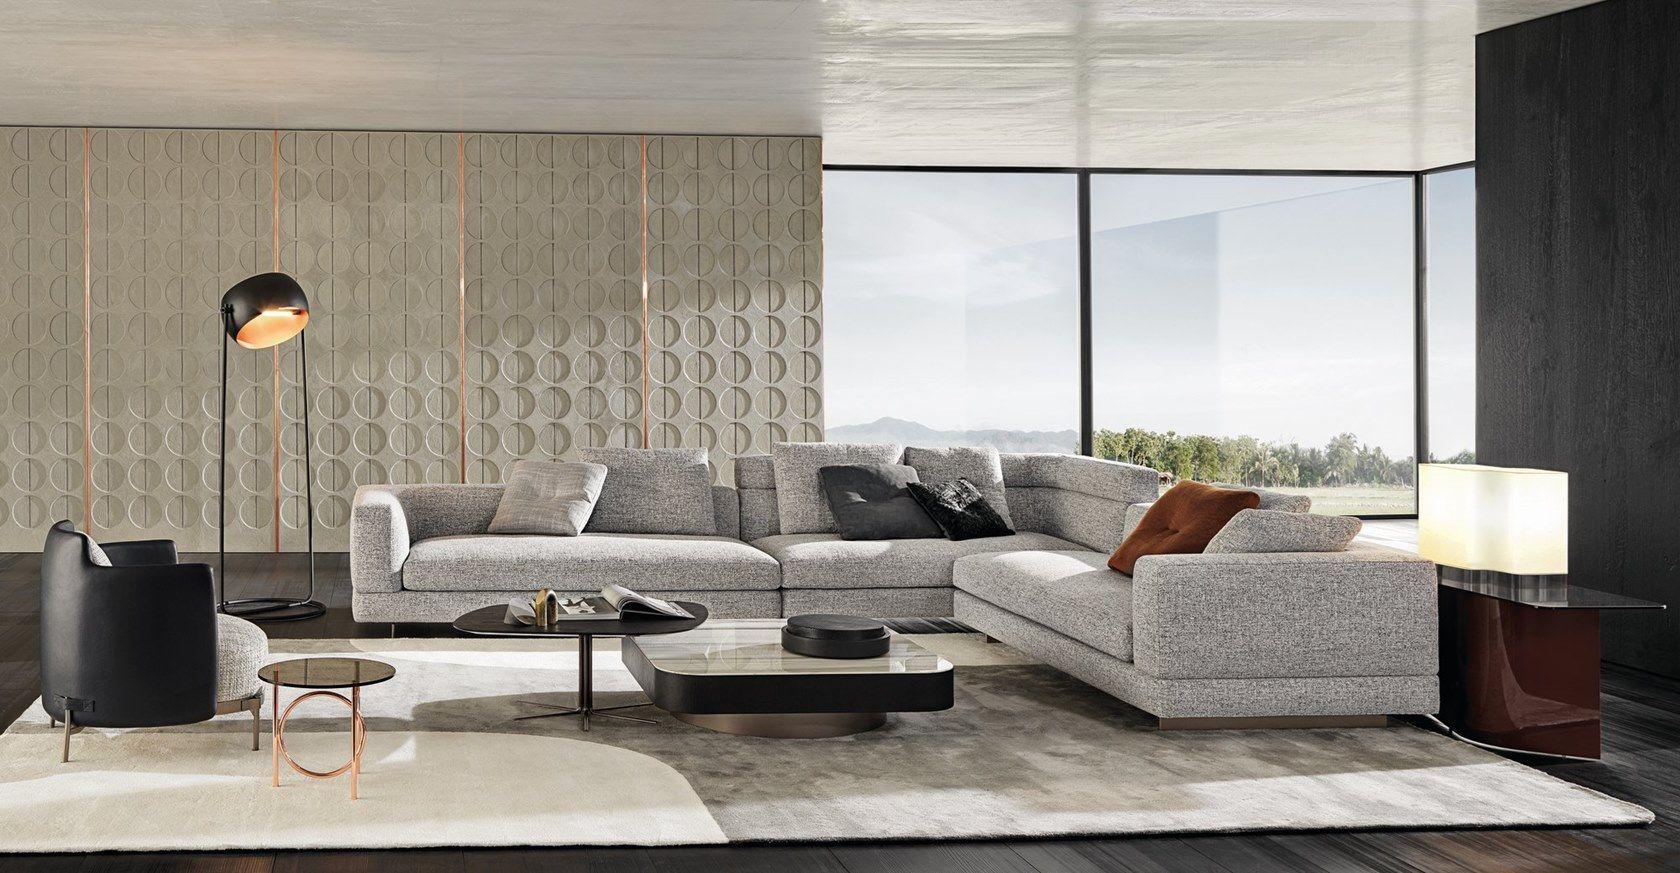 Sofa ALEXANDER by Minotti in 2020 | Hall interior design ...